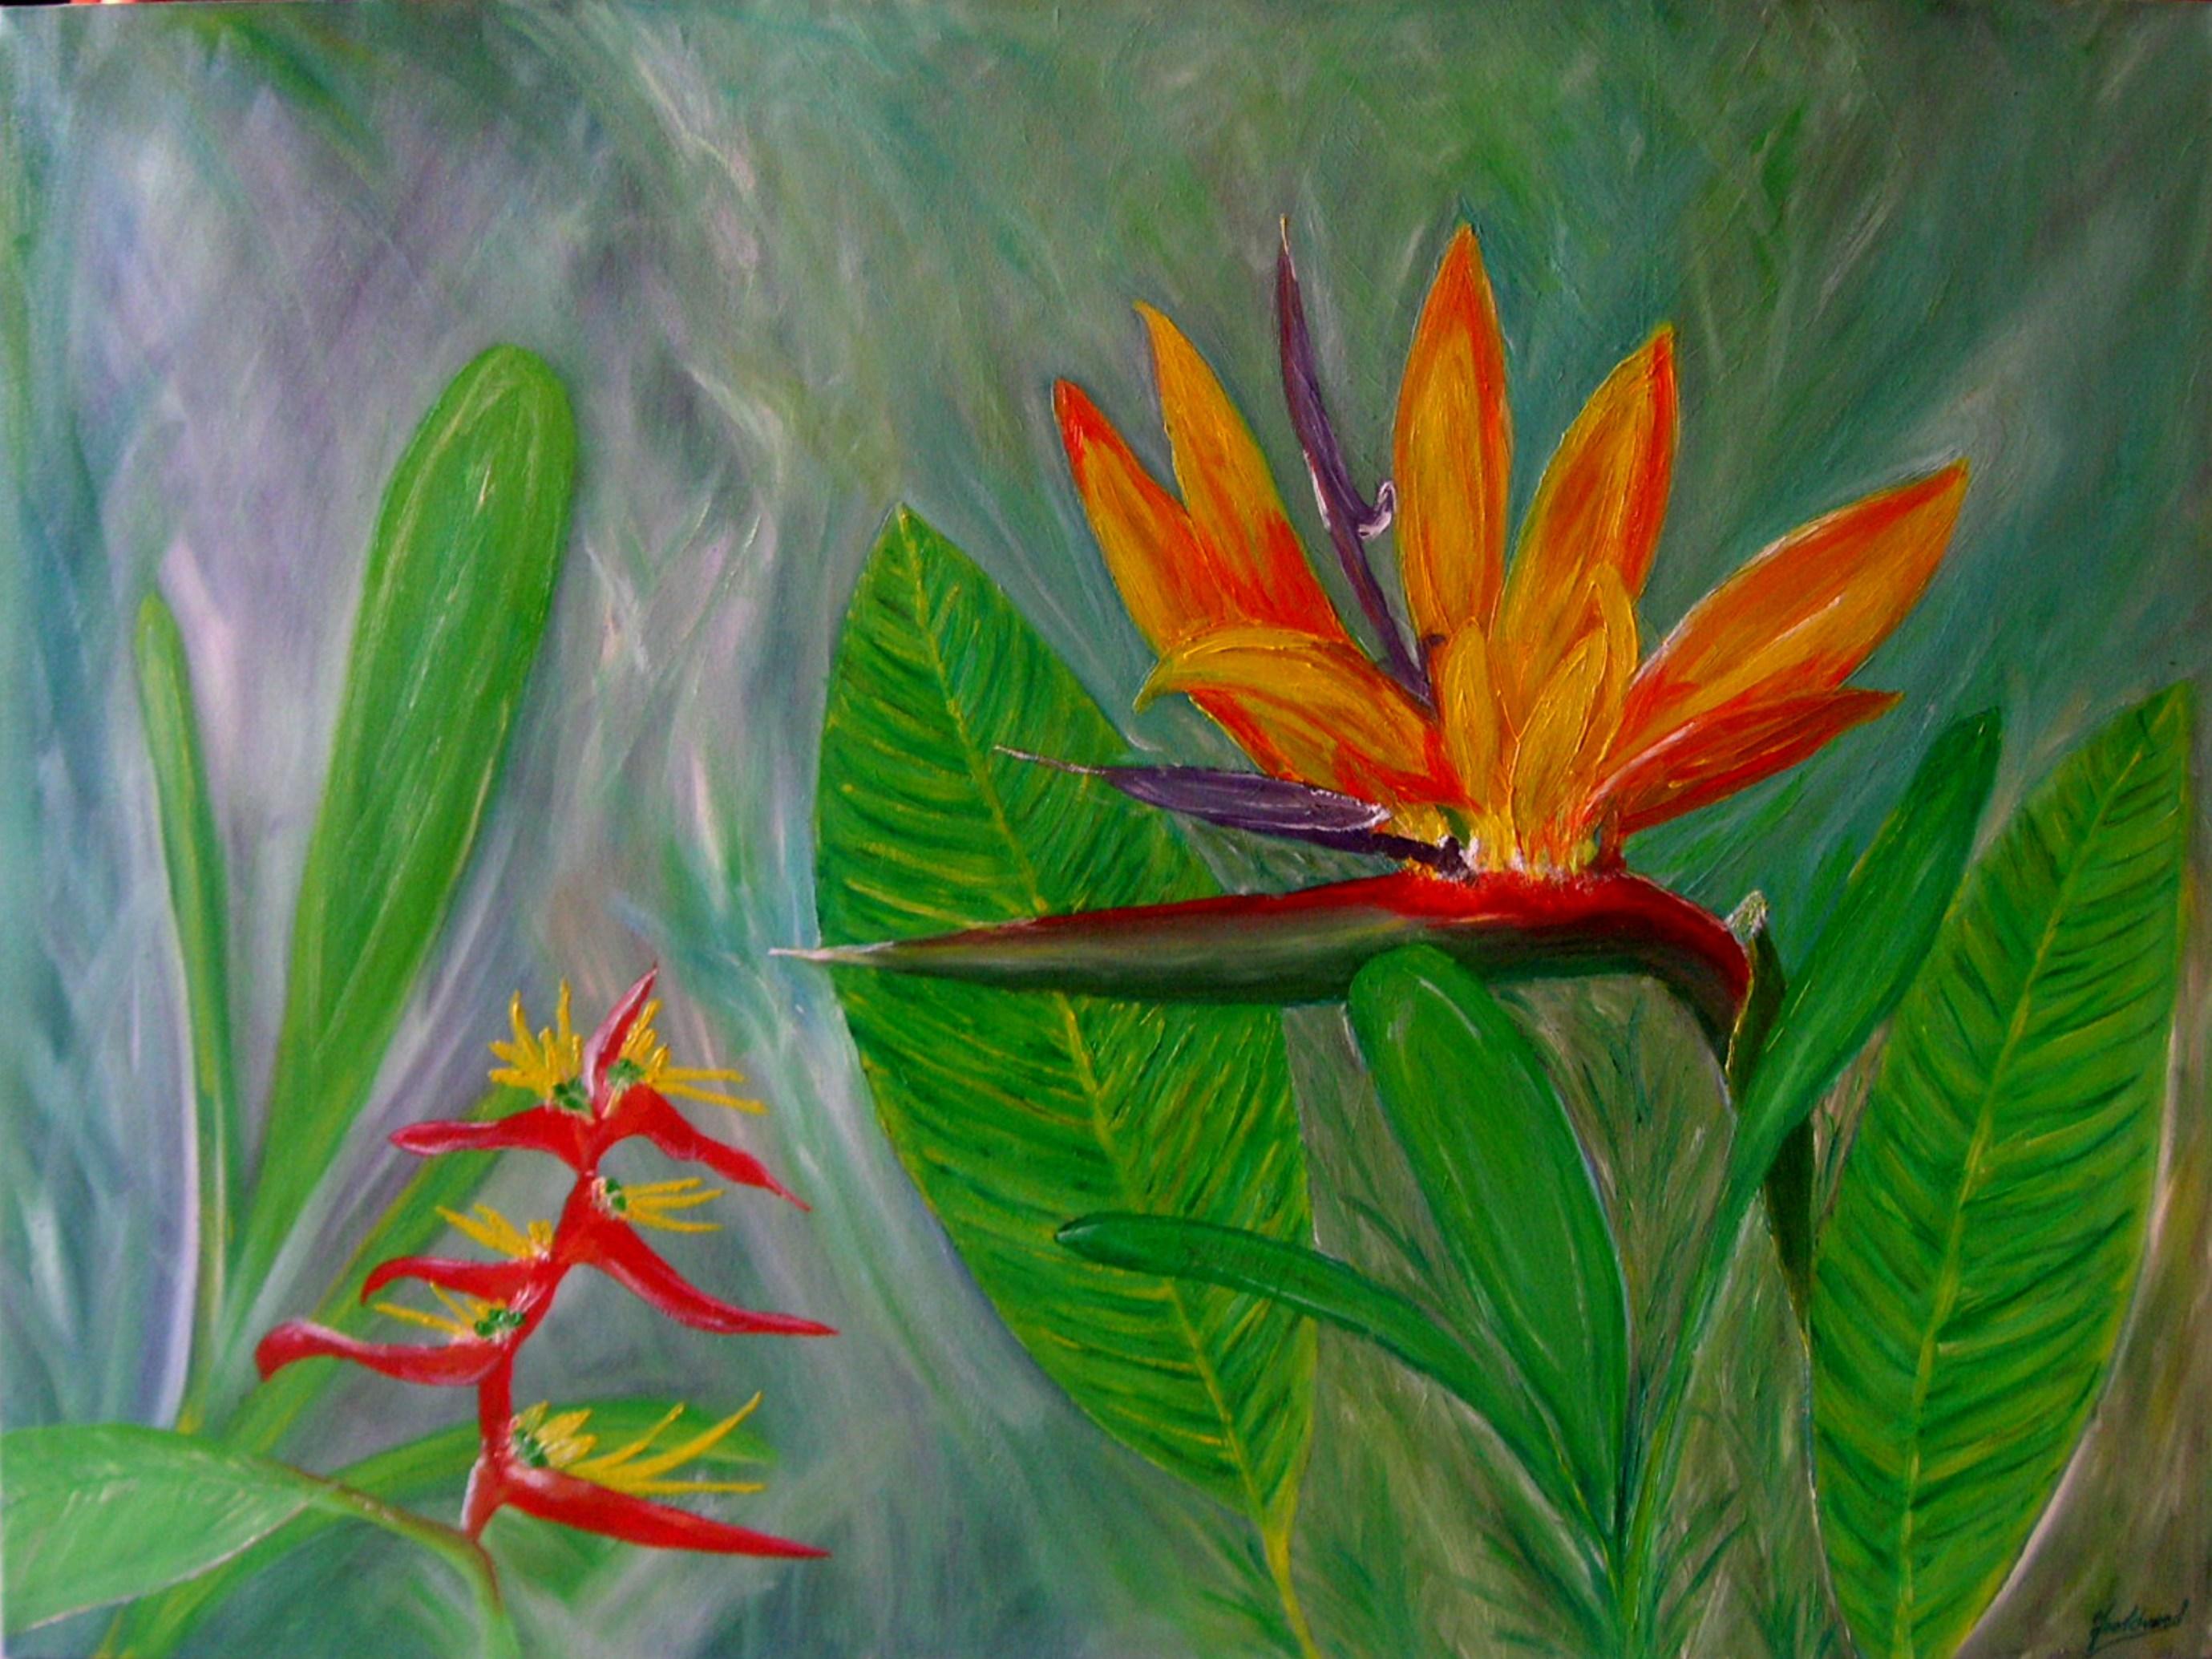 Artiste peintre tableaux galerie peinture huile - Tableaux de peinture a l huile ...